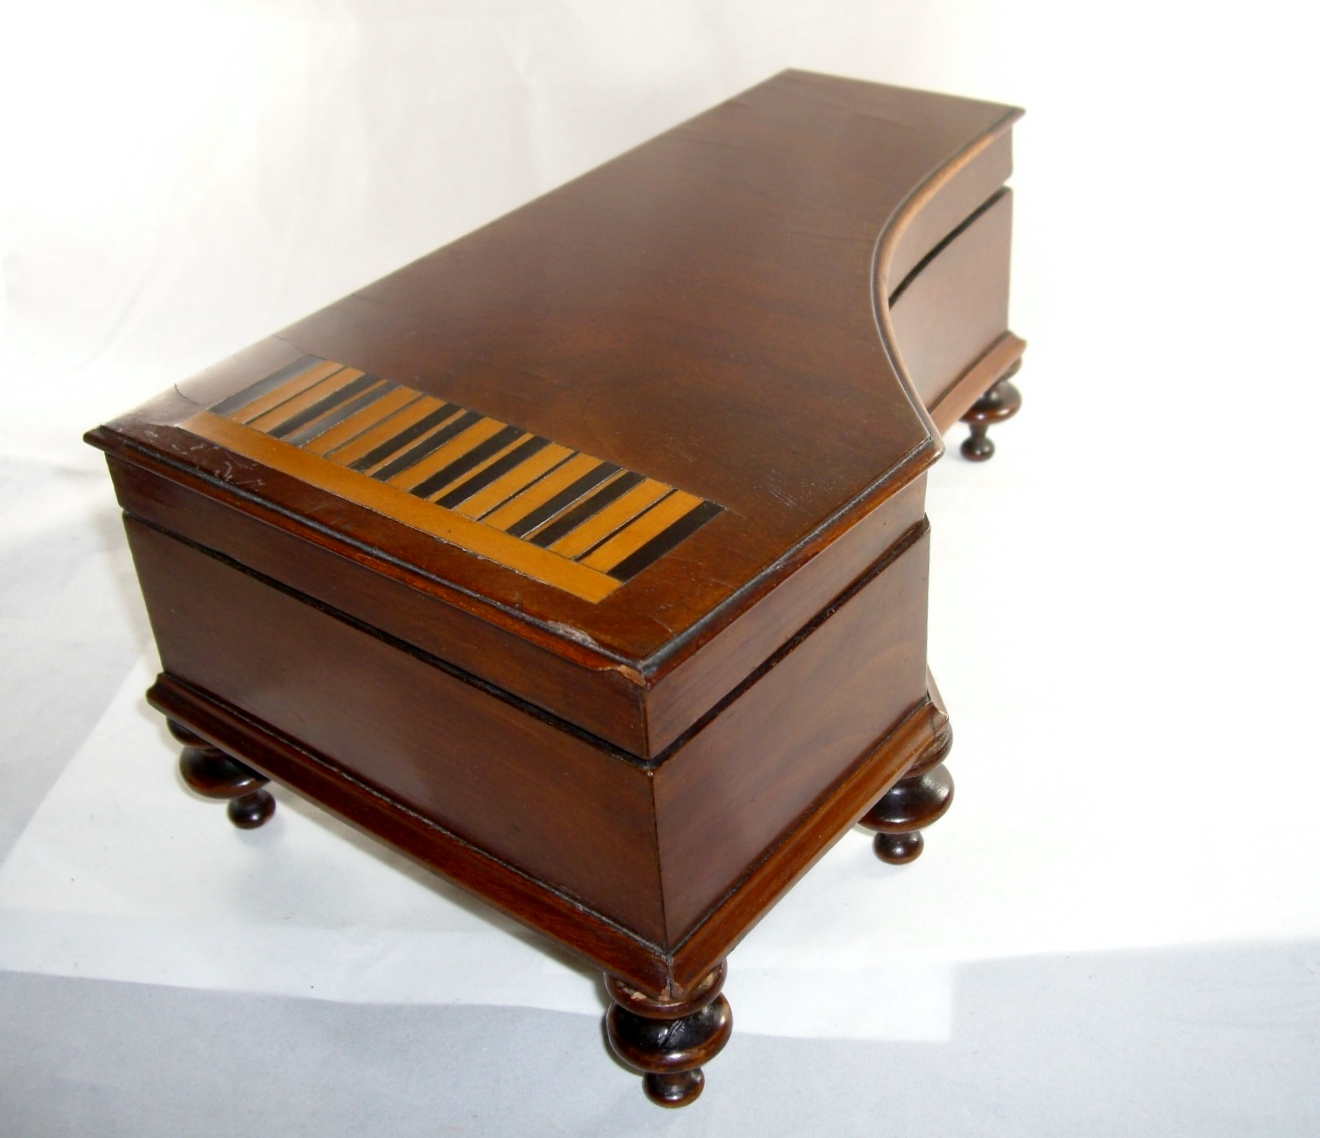 Antique Miniature Inlaid Wood Piano Jewelry Trinket Box